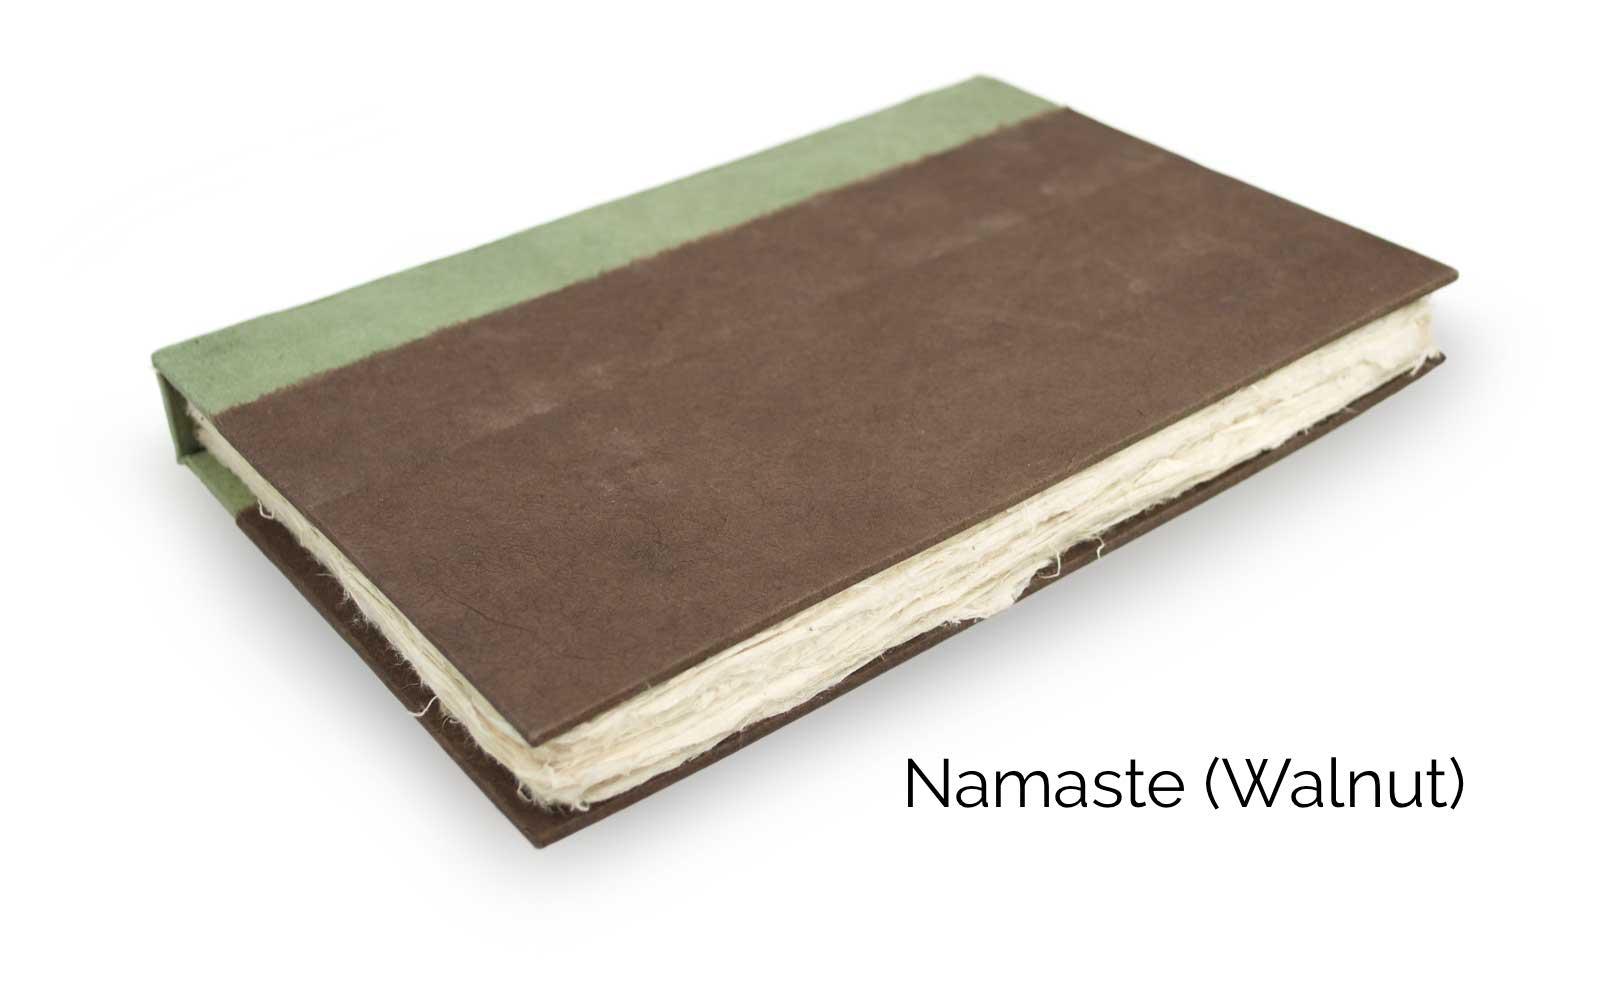 Nepali Namaste Journal Kathmandu Valley Co